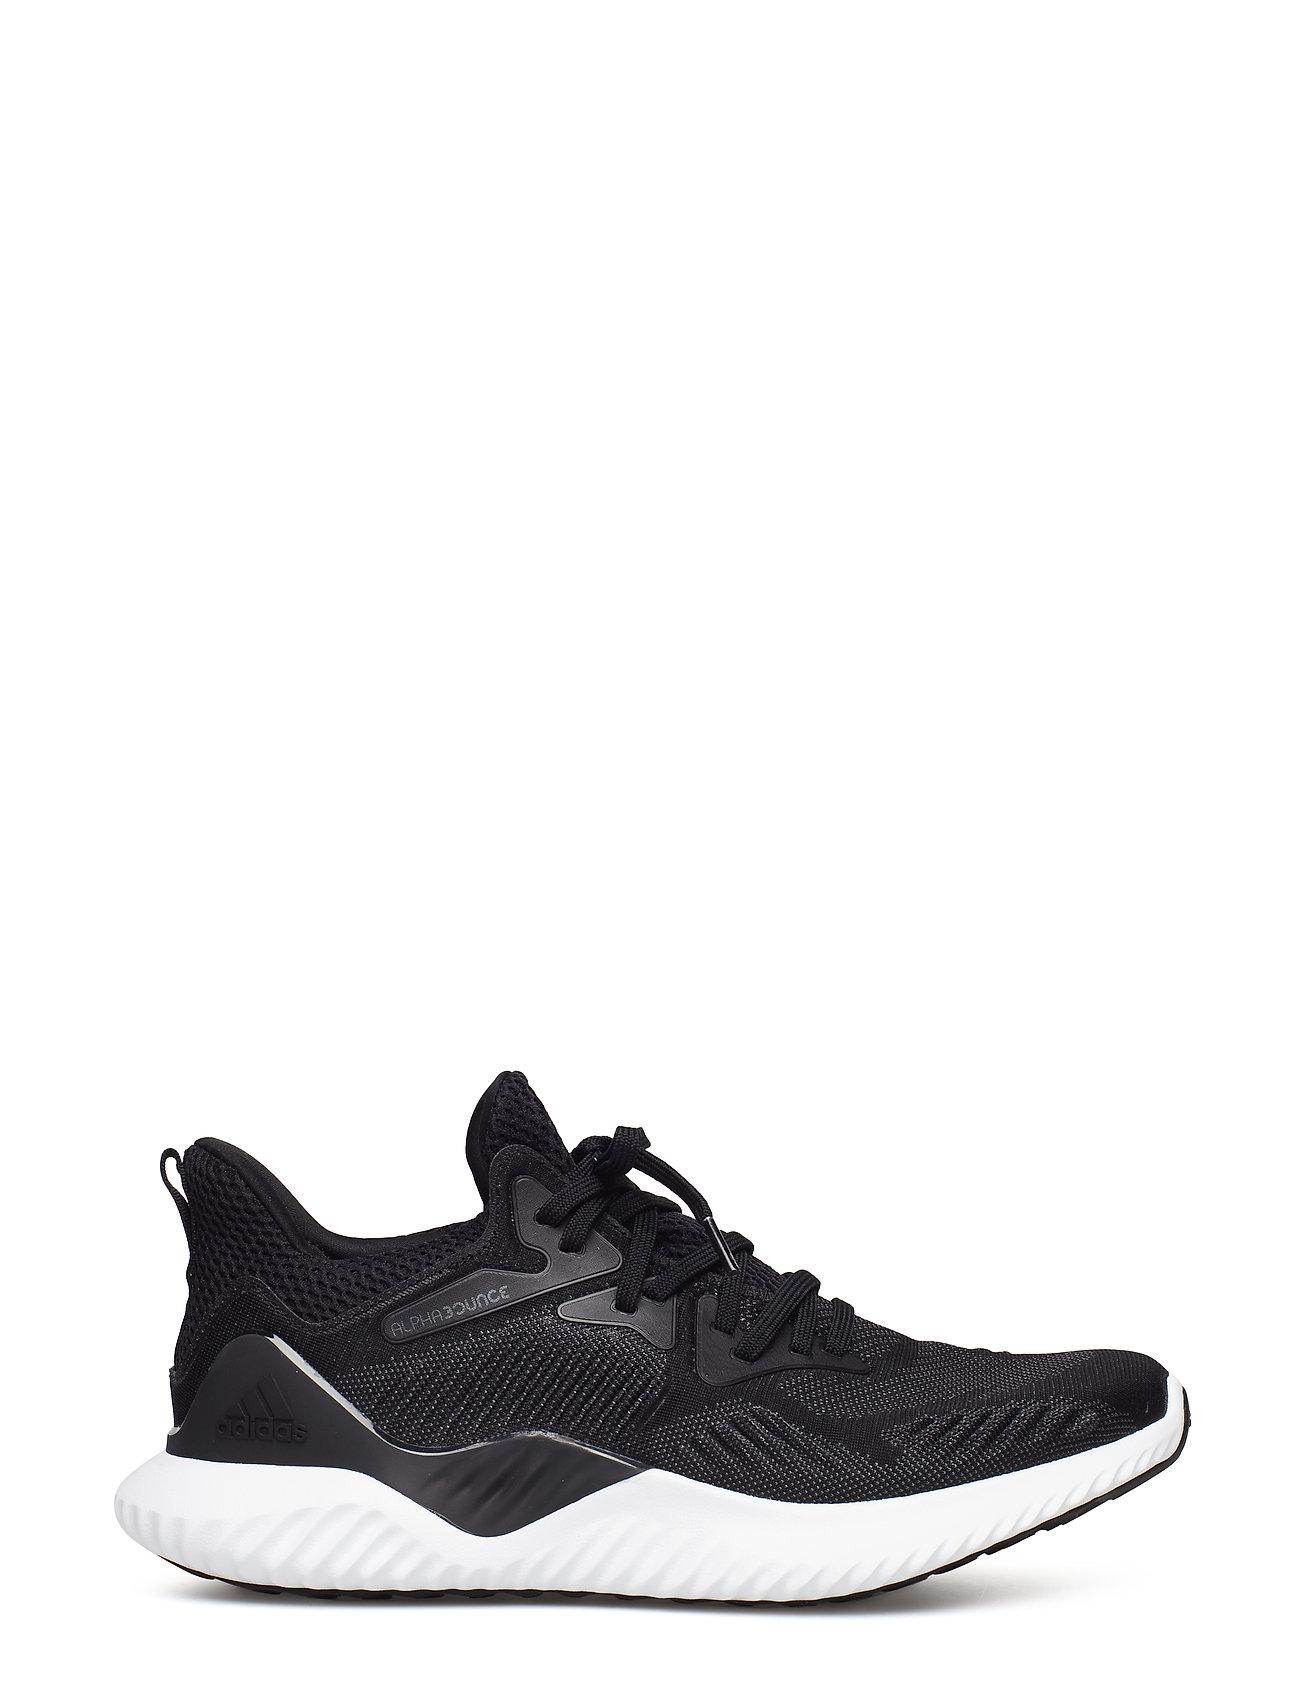 best service 16cf2 51587 Adidas ALE Kengat netistä   Nyt jopa -60%   SPOT-A-SHOP